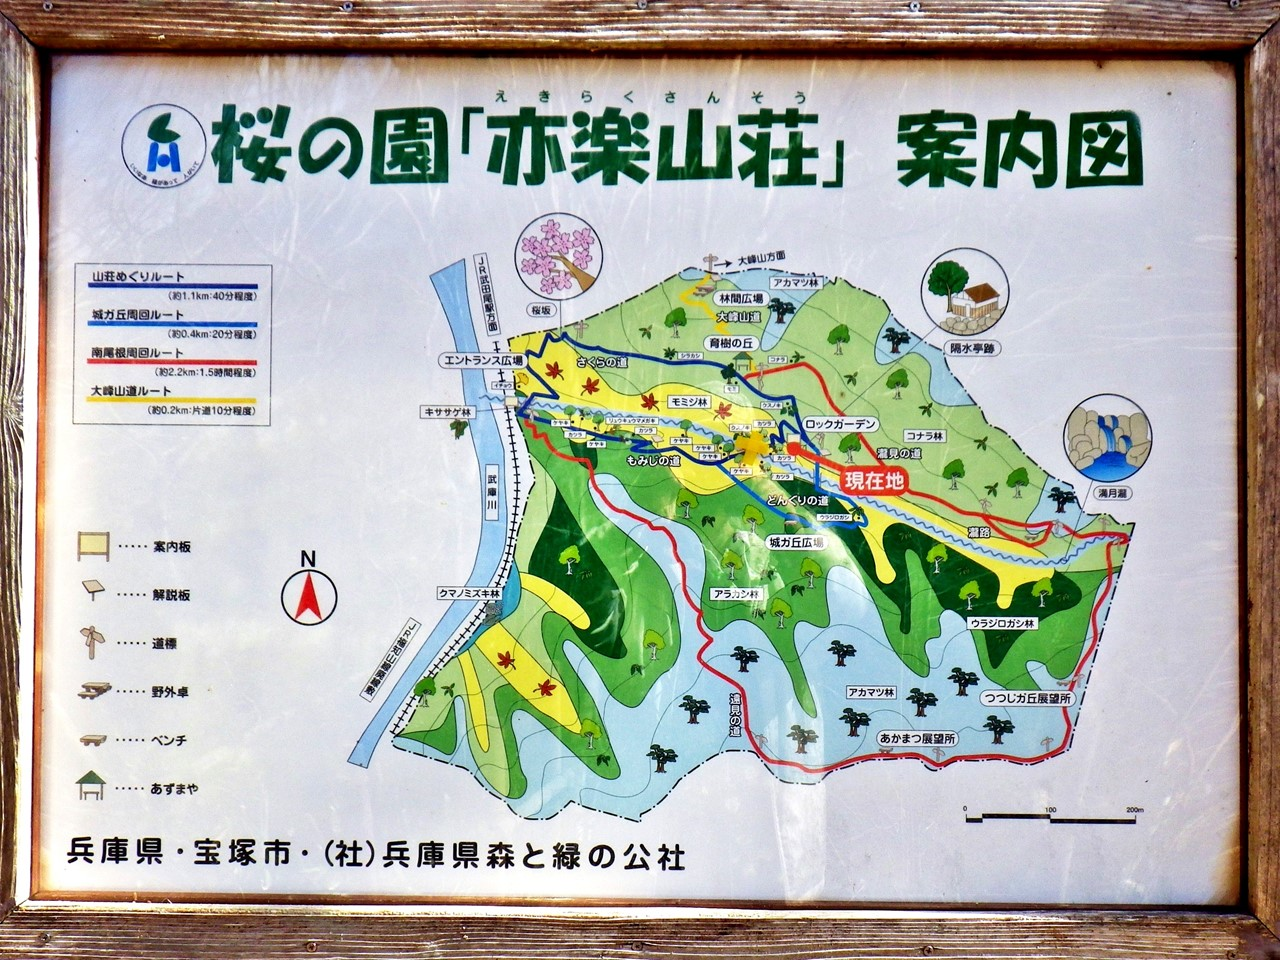 10a 亦楽山荘の案内図